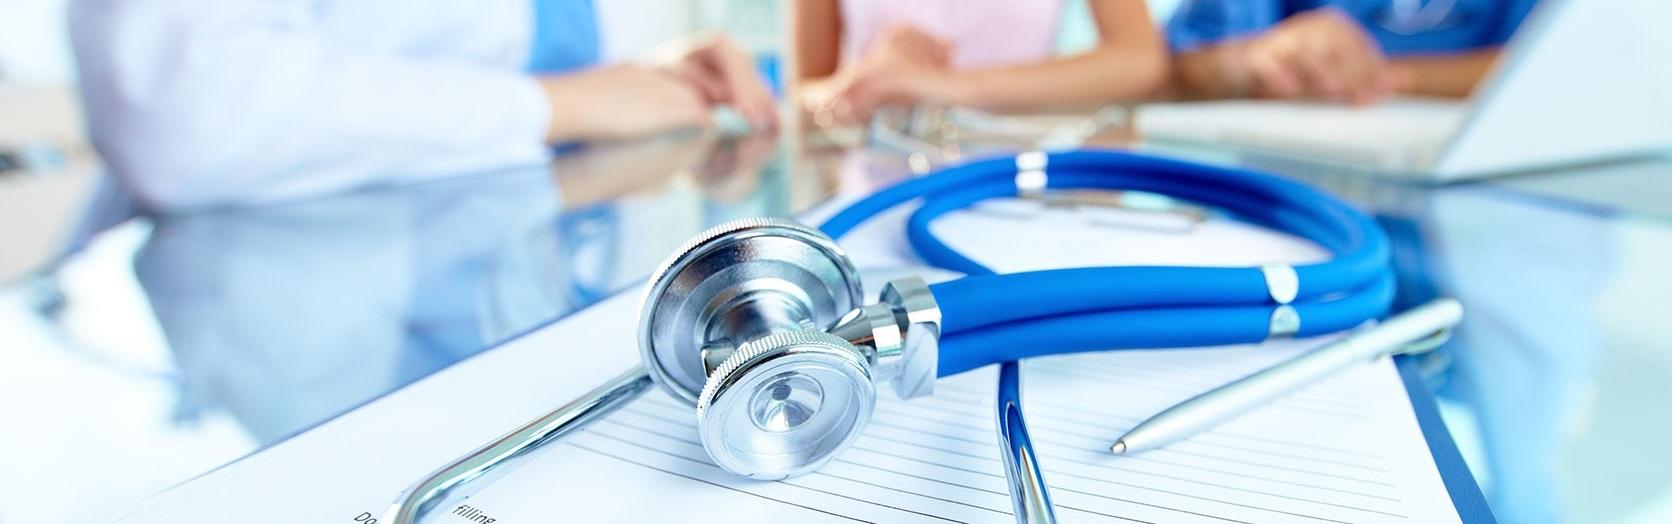 #Medical Supplies